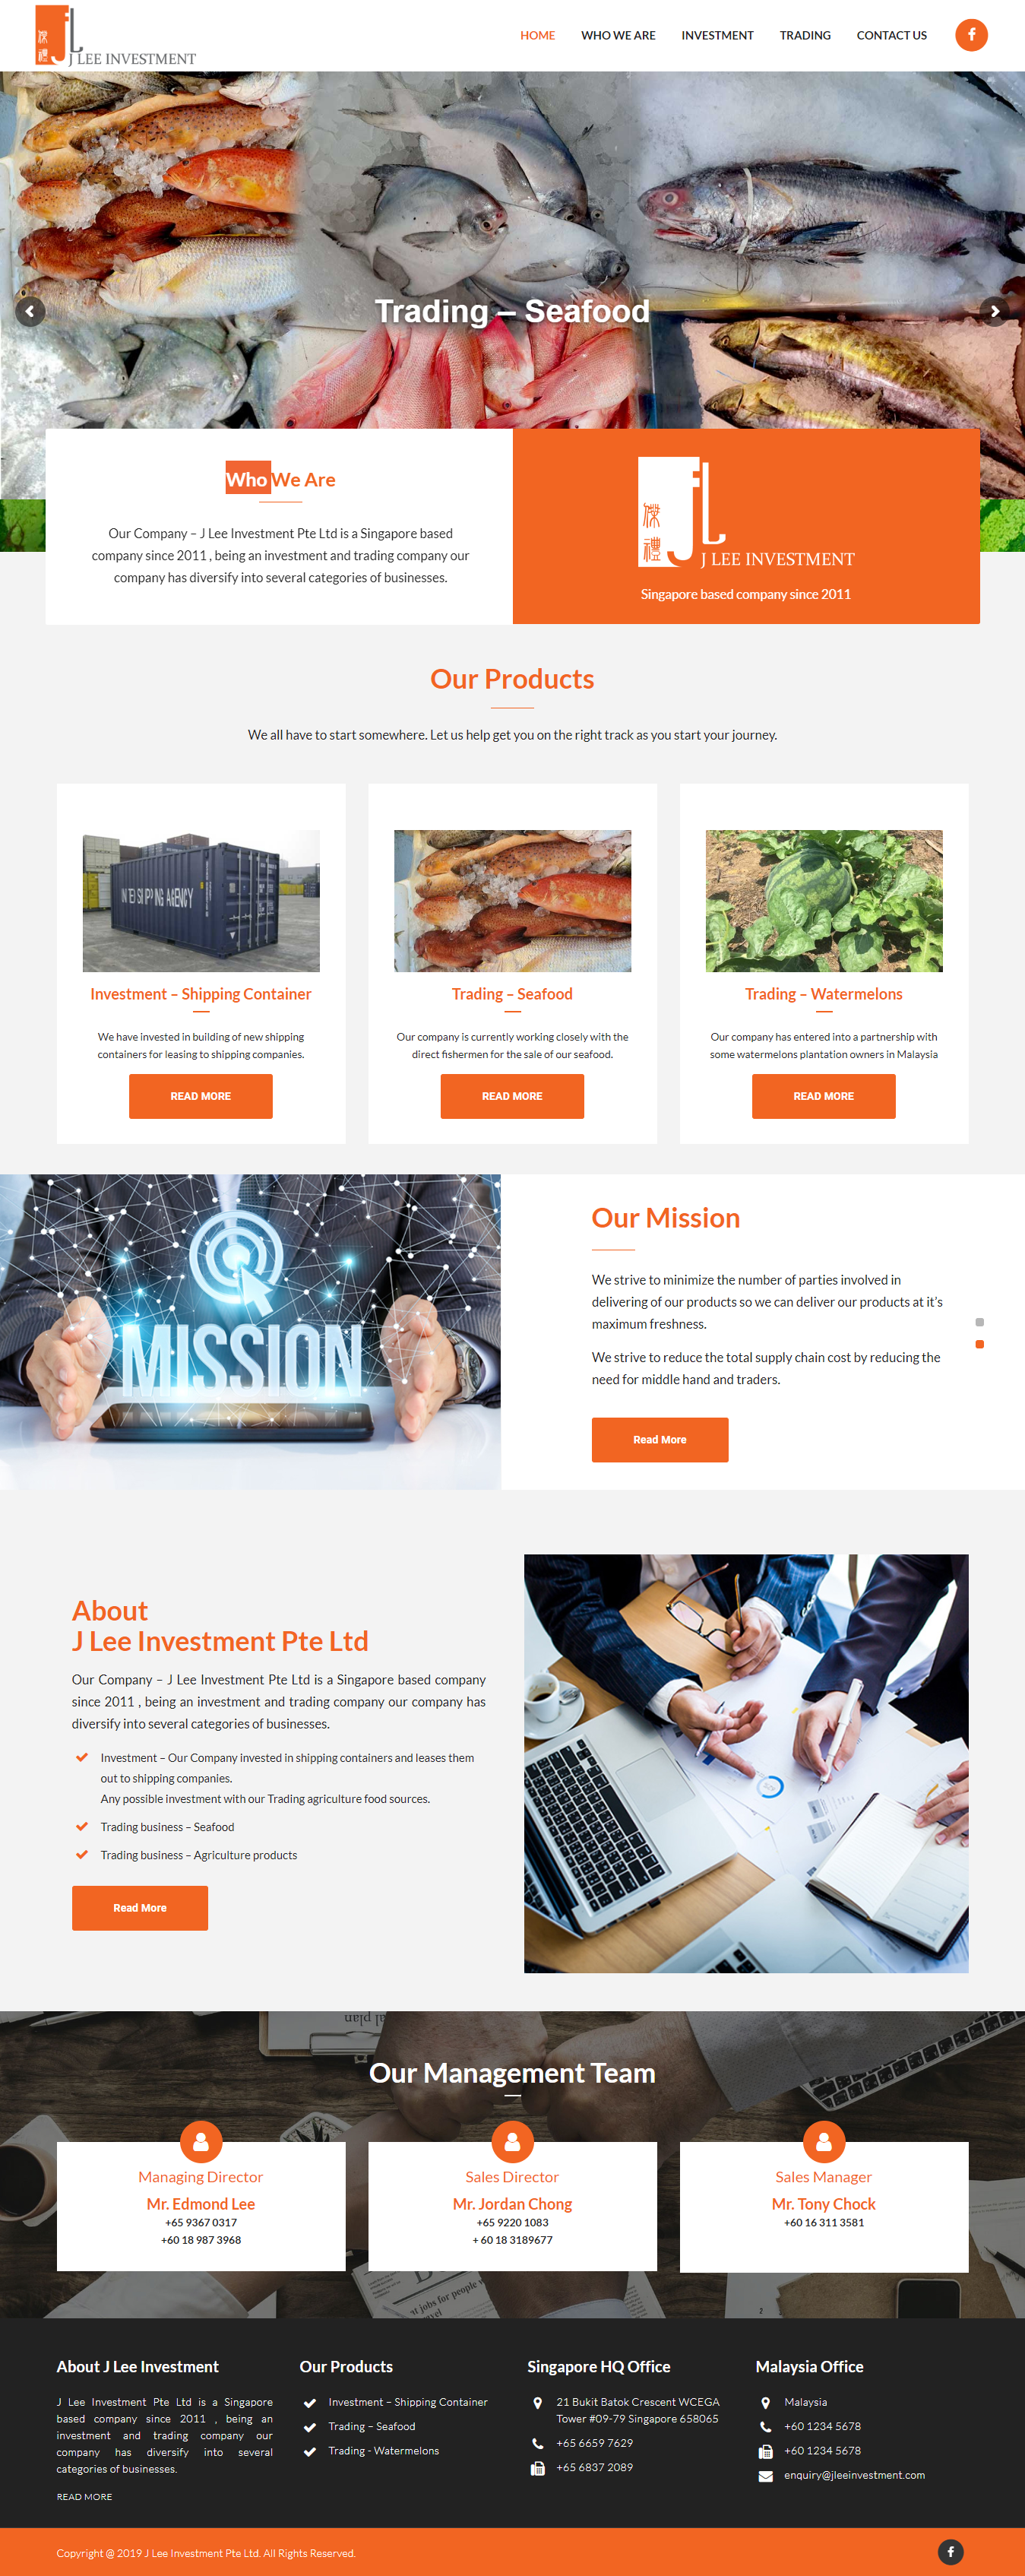 Website Design Services Development Support Maintenance Cms Ecommerce Domain Host Web Development Design Website Development Corporate Website Design